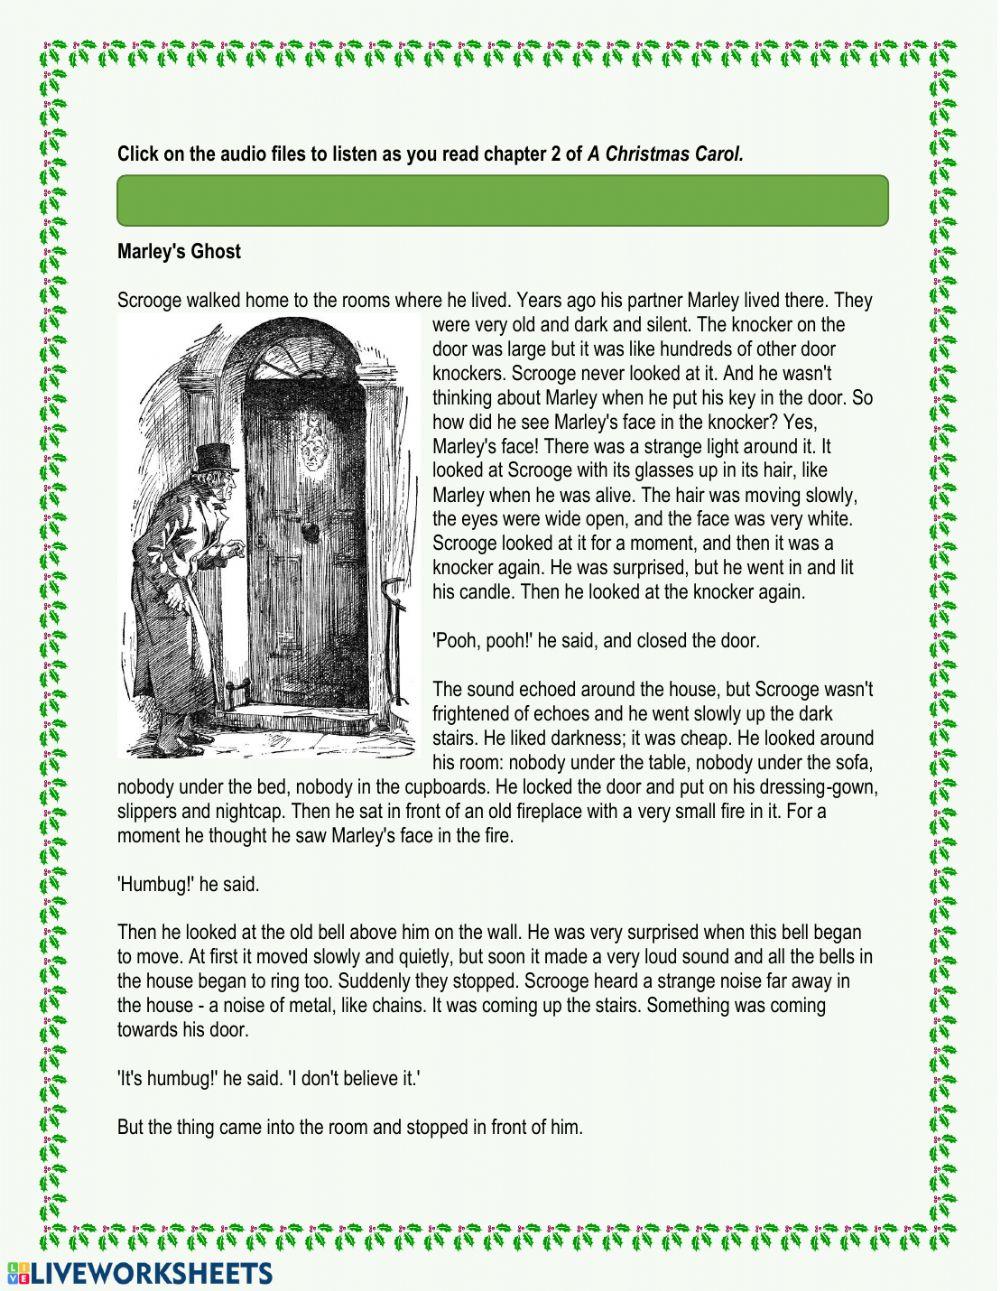 A Christmas Carol - Chapter 2 Worksheet